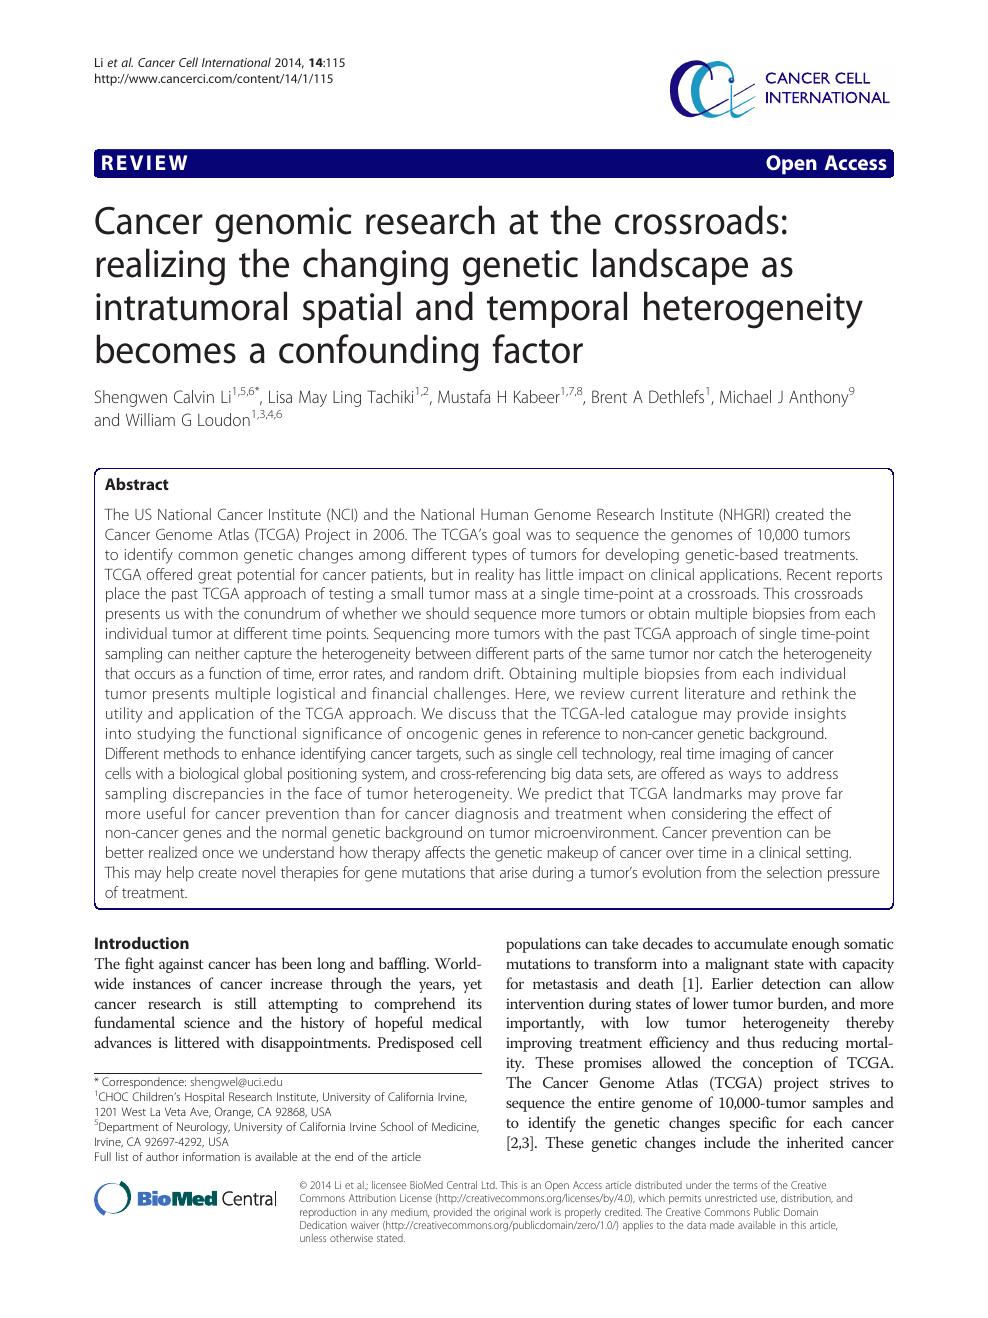 cancer genetic ltd)